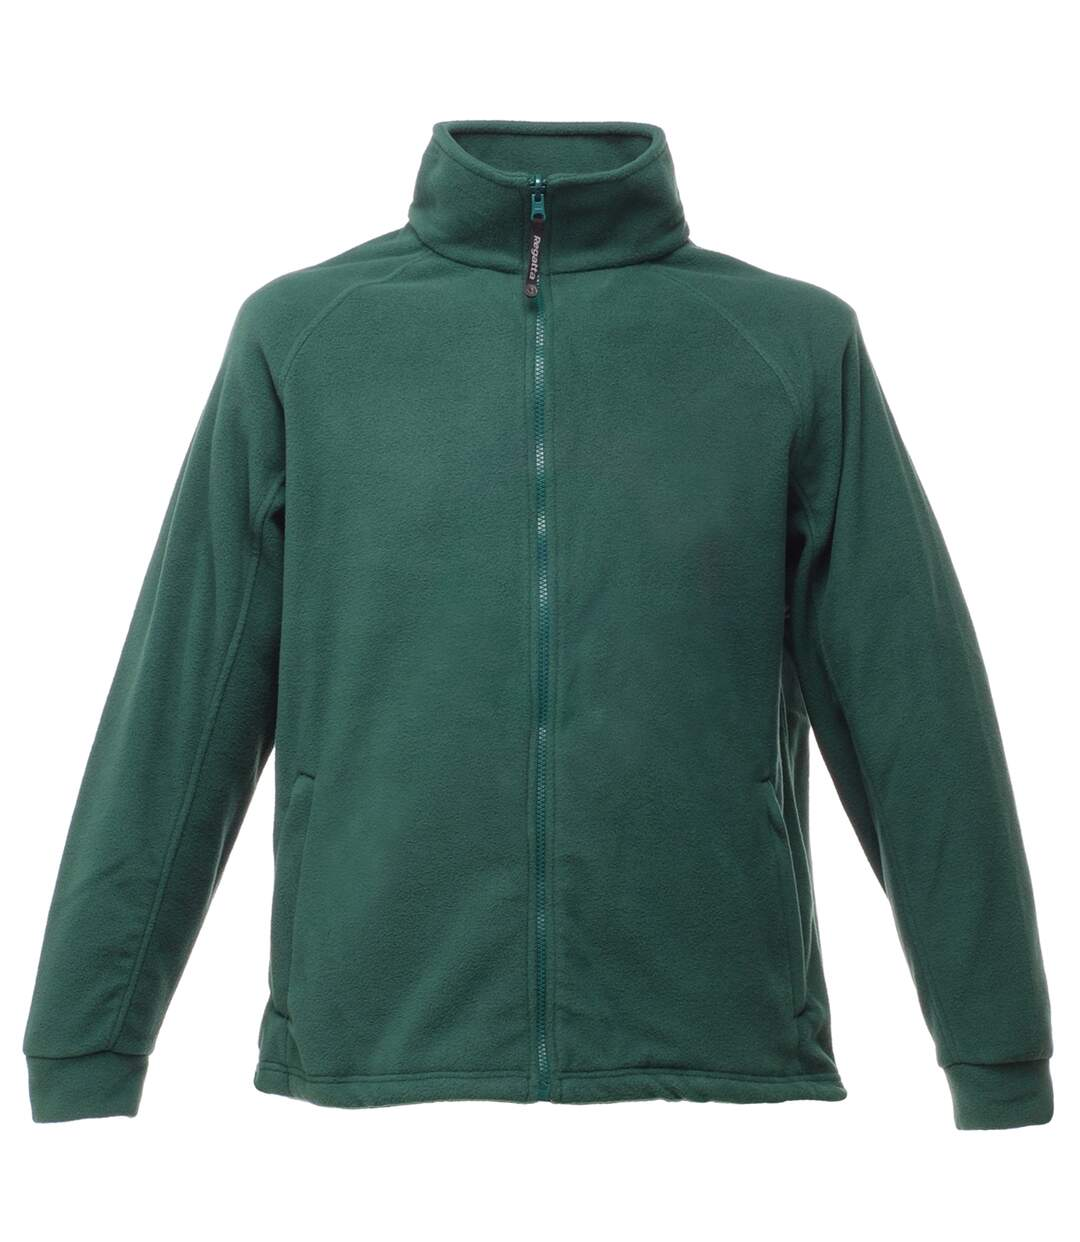 Regatta Mens Thor III Anti-Pill Fleece Jacket (Bottle Green) - UTRW1198